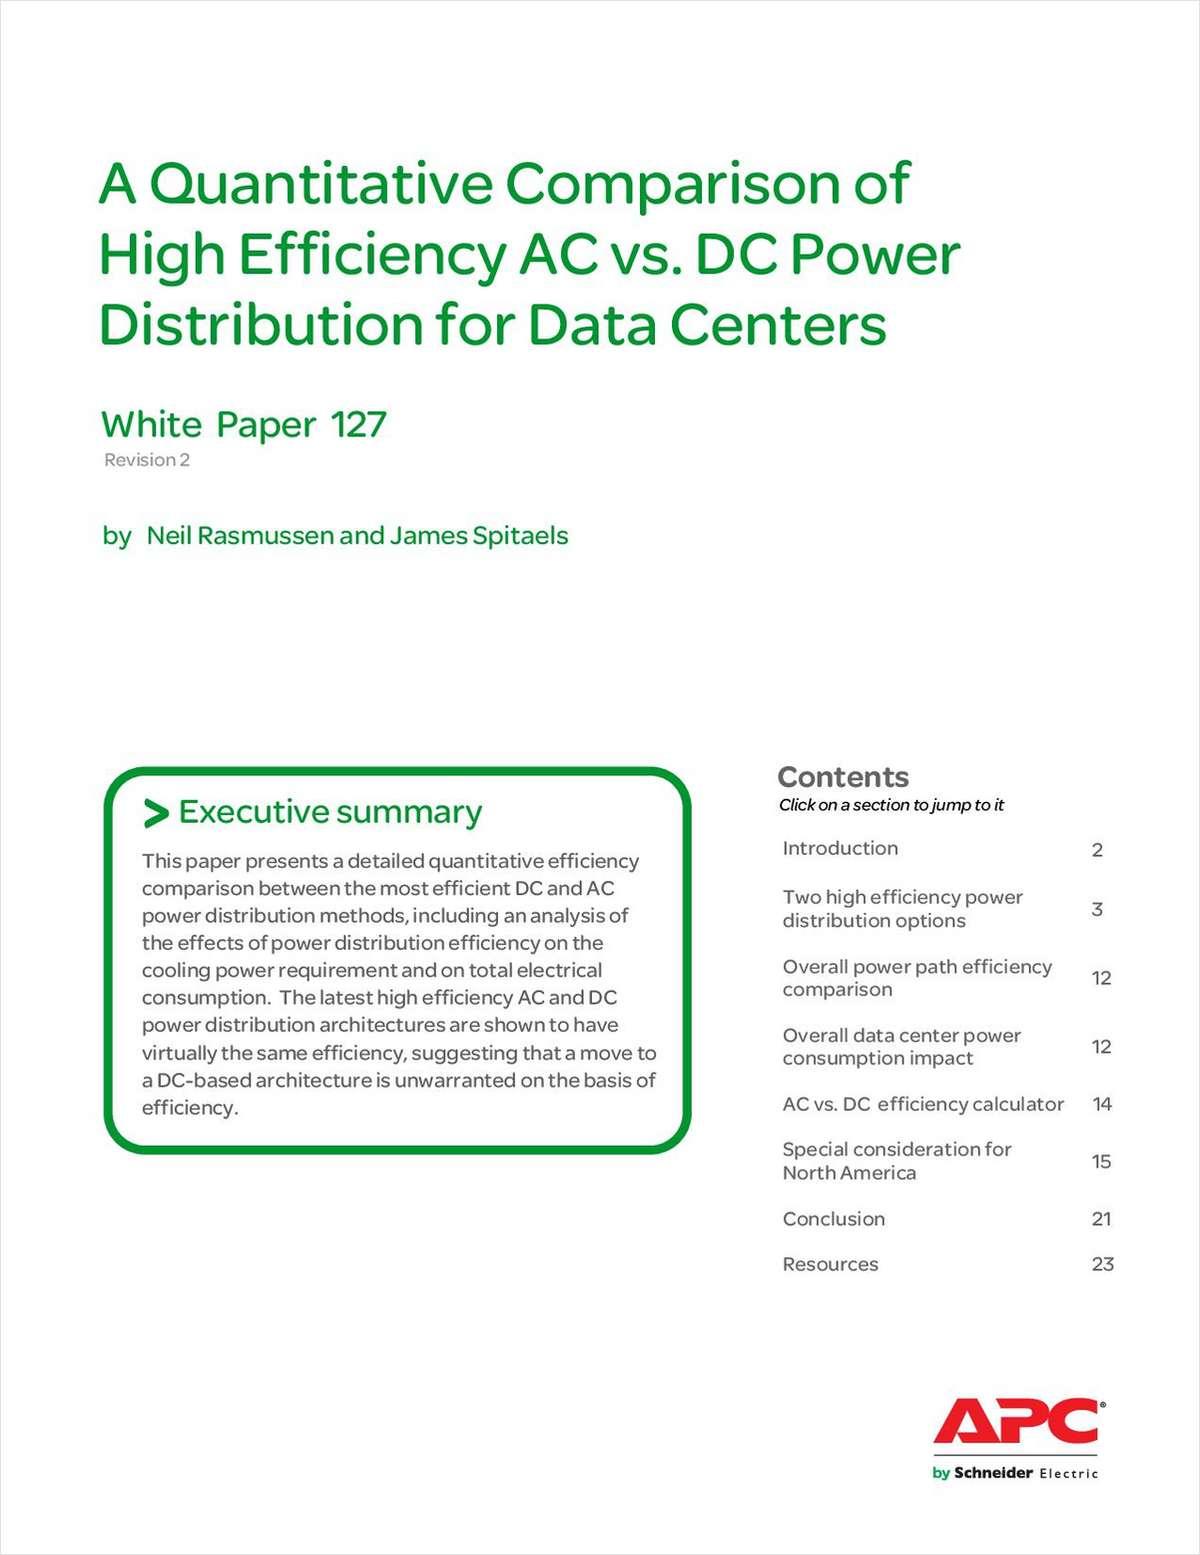 A Quantitative Comparison of High Efficiency AC vs. DC Power Distribution for Data Centers